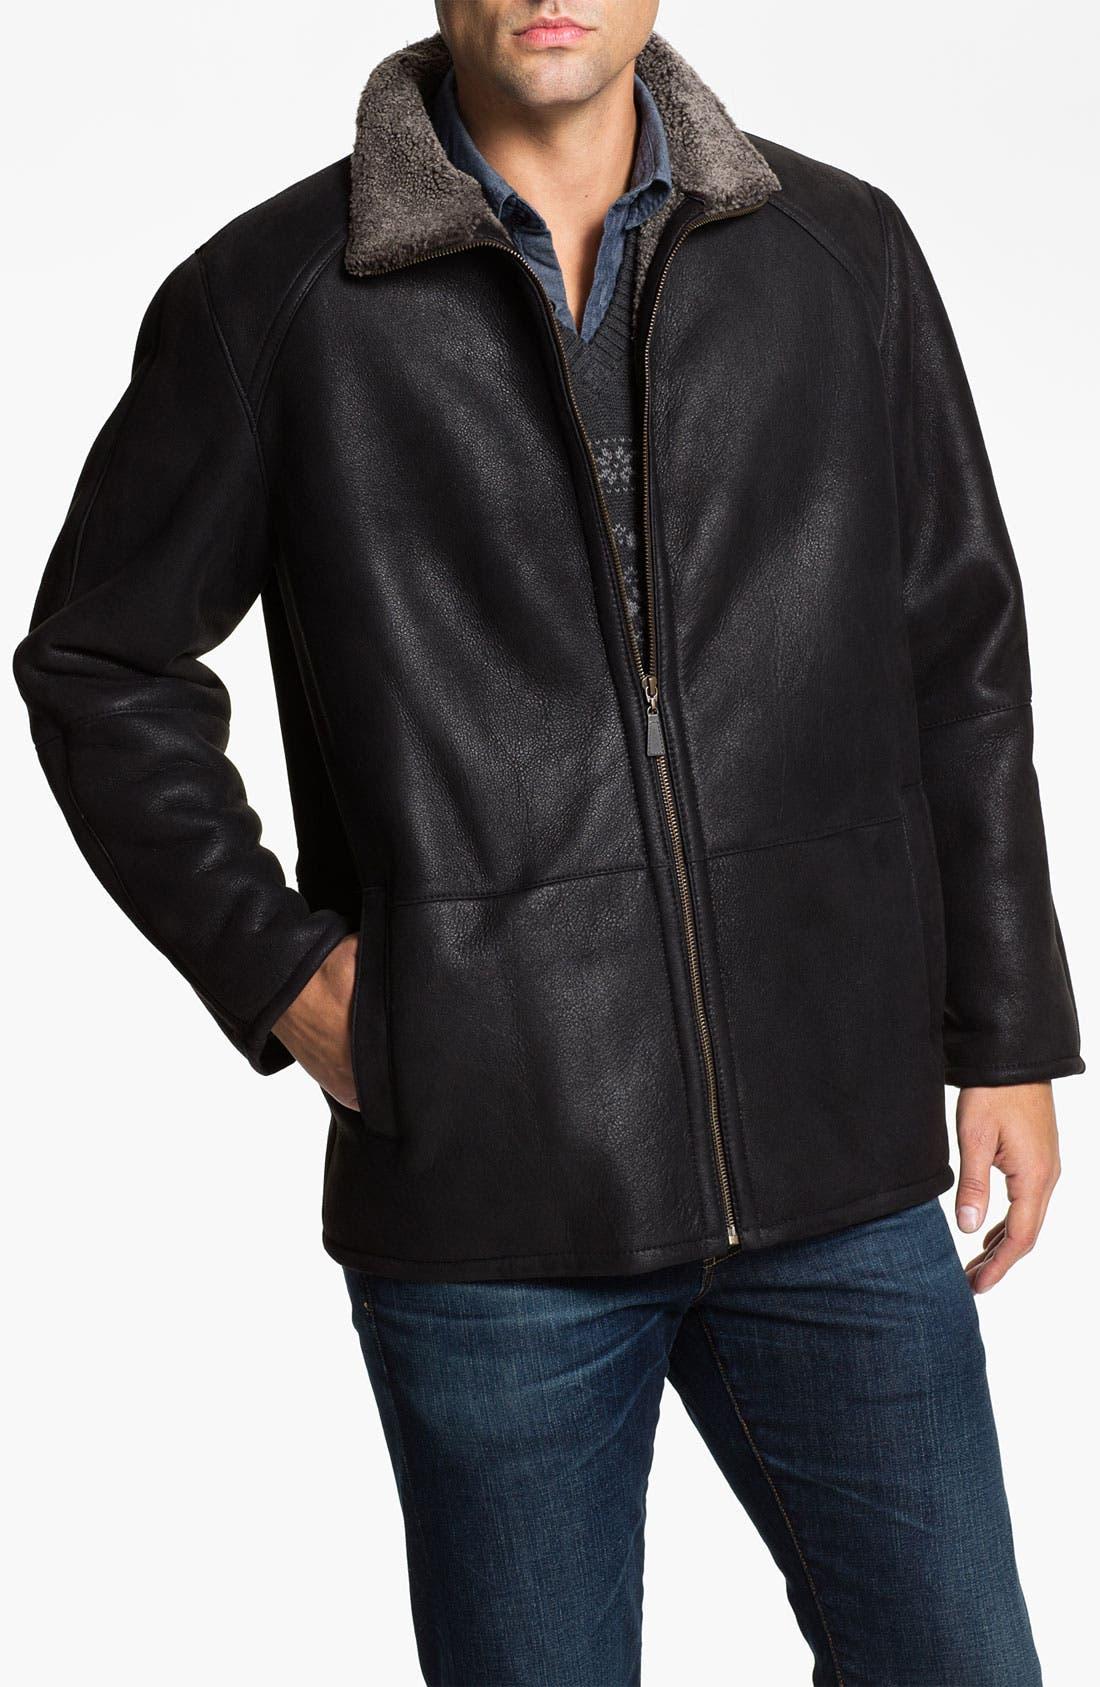 Main Image - Blue Duck Leather Jacket